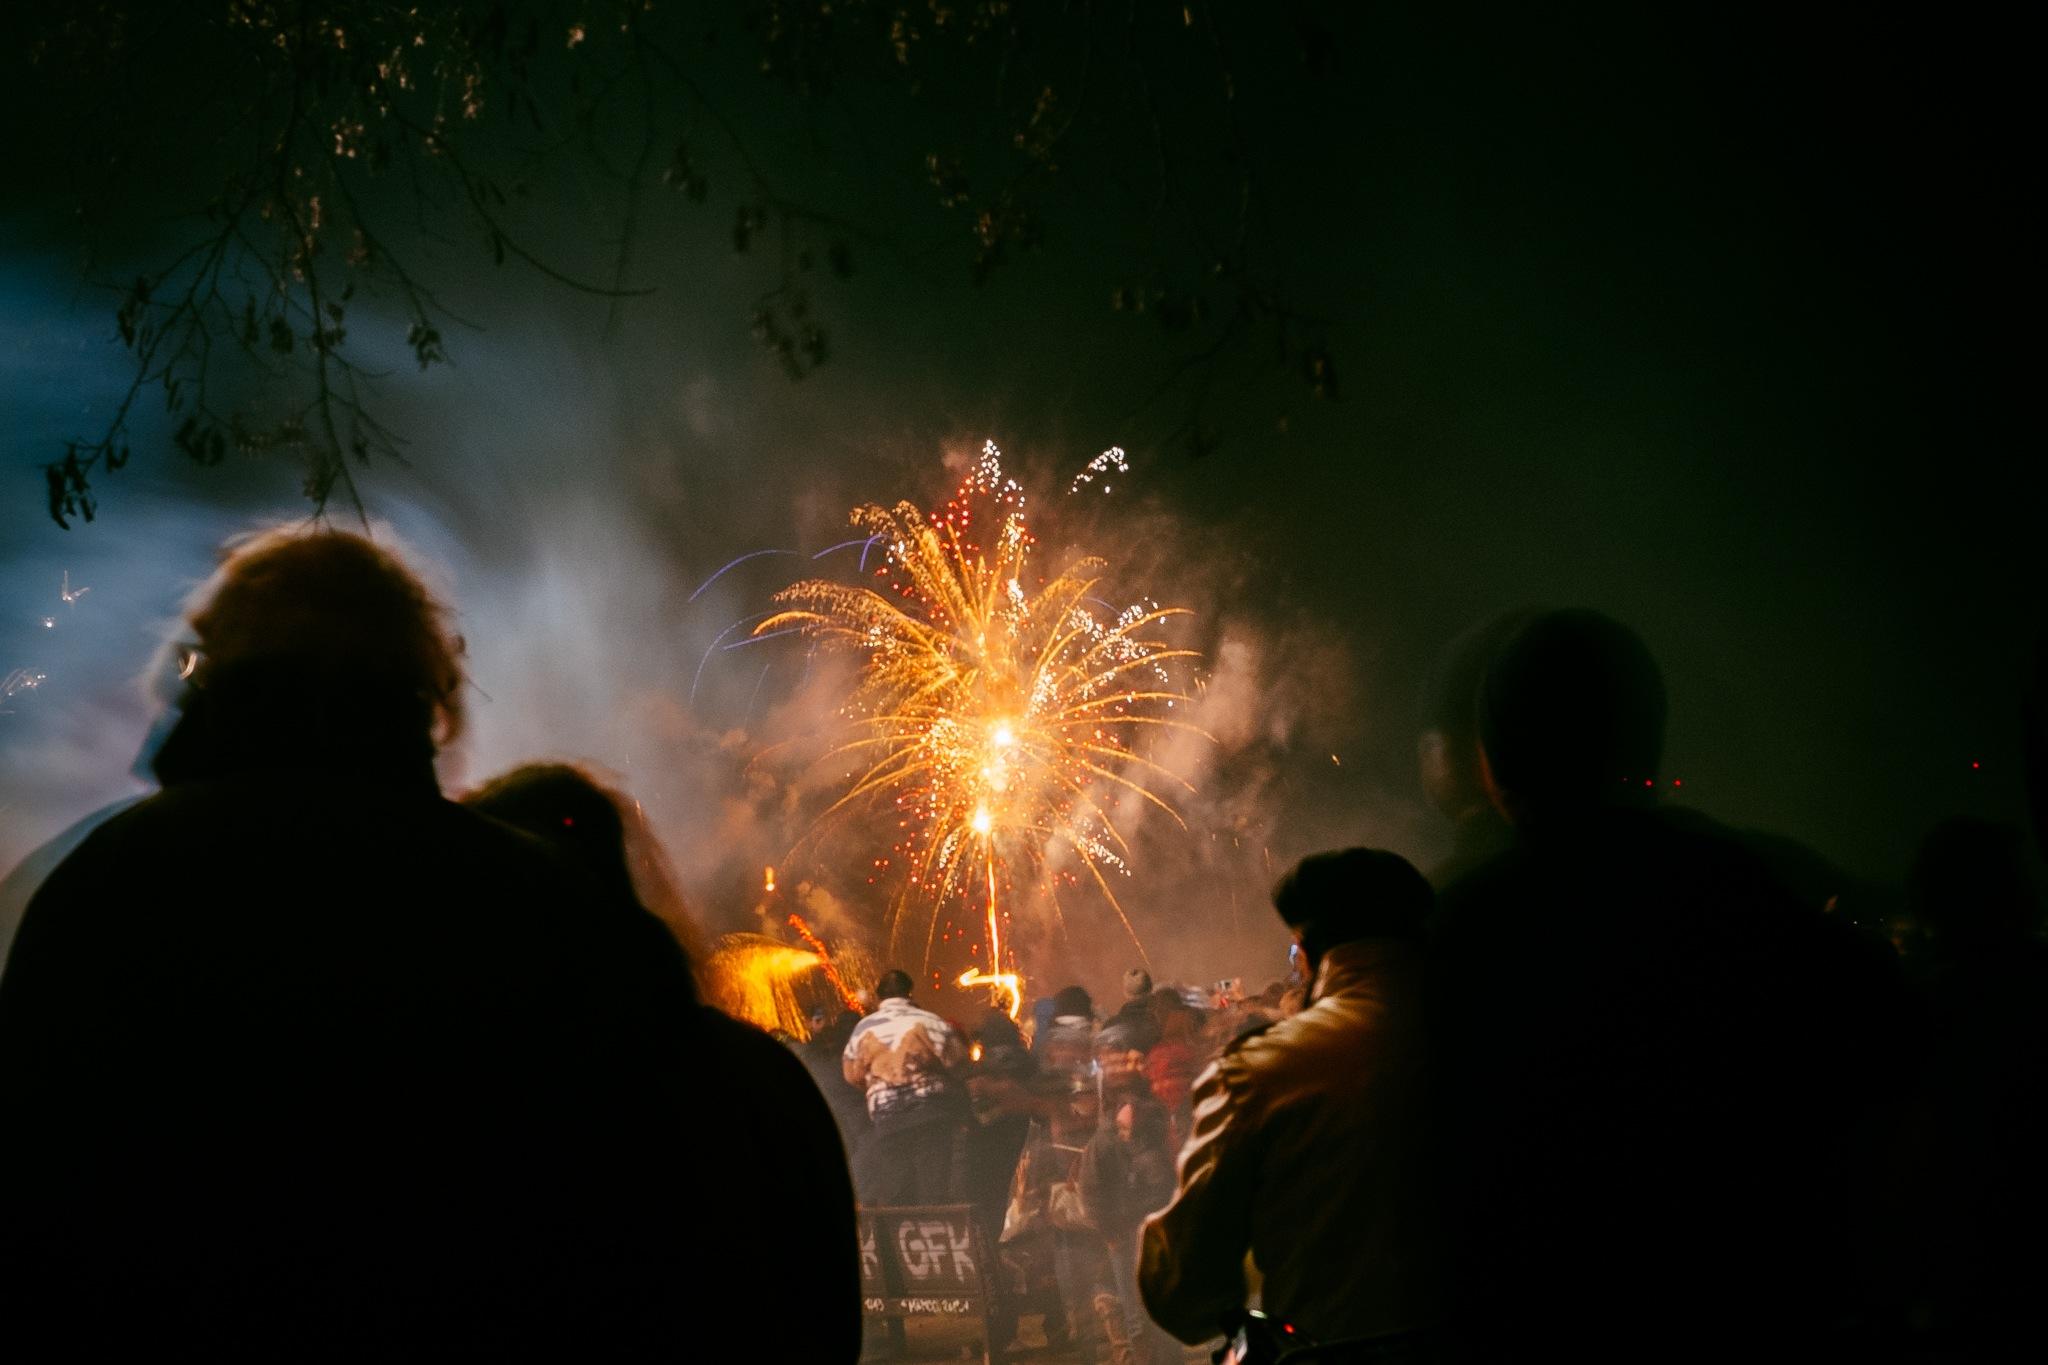 People standing in the dark watching fireworks.